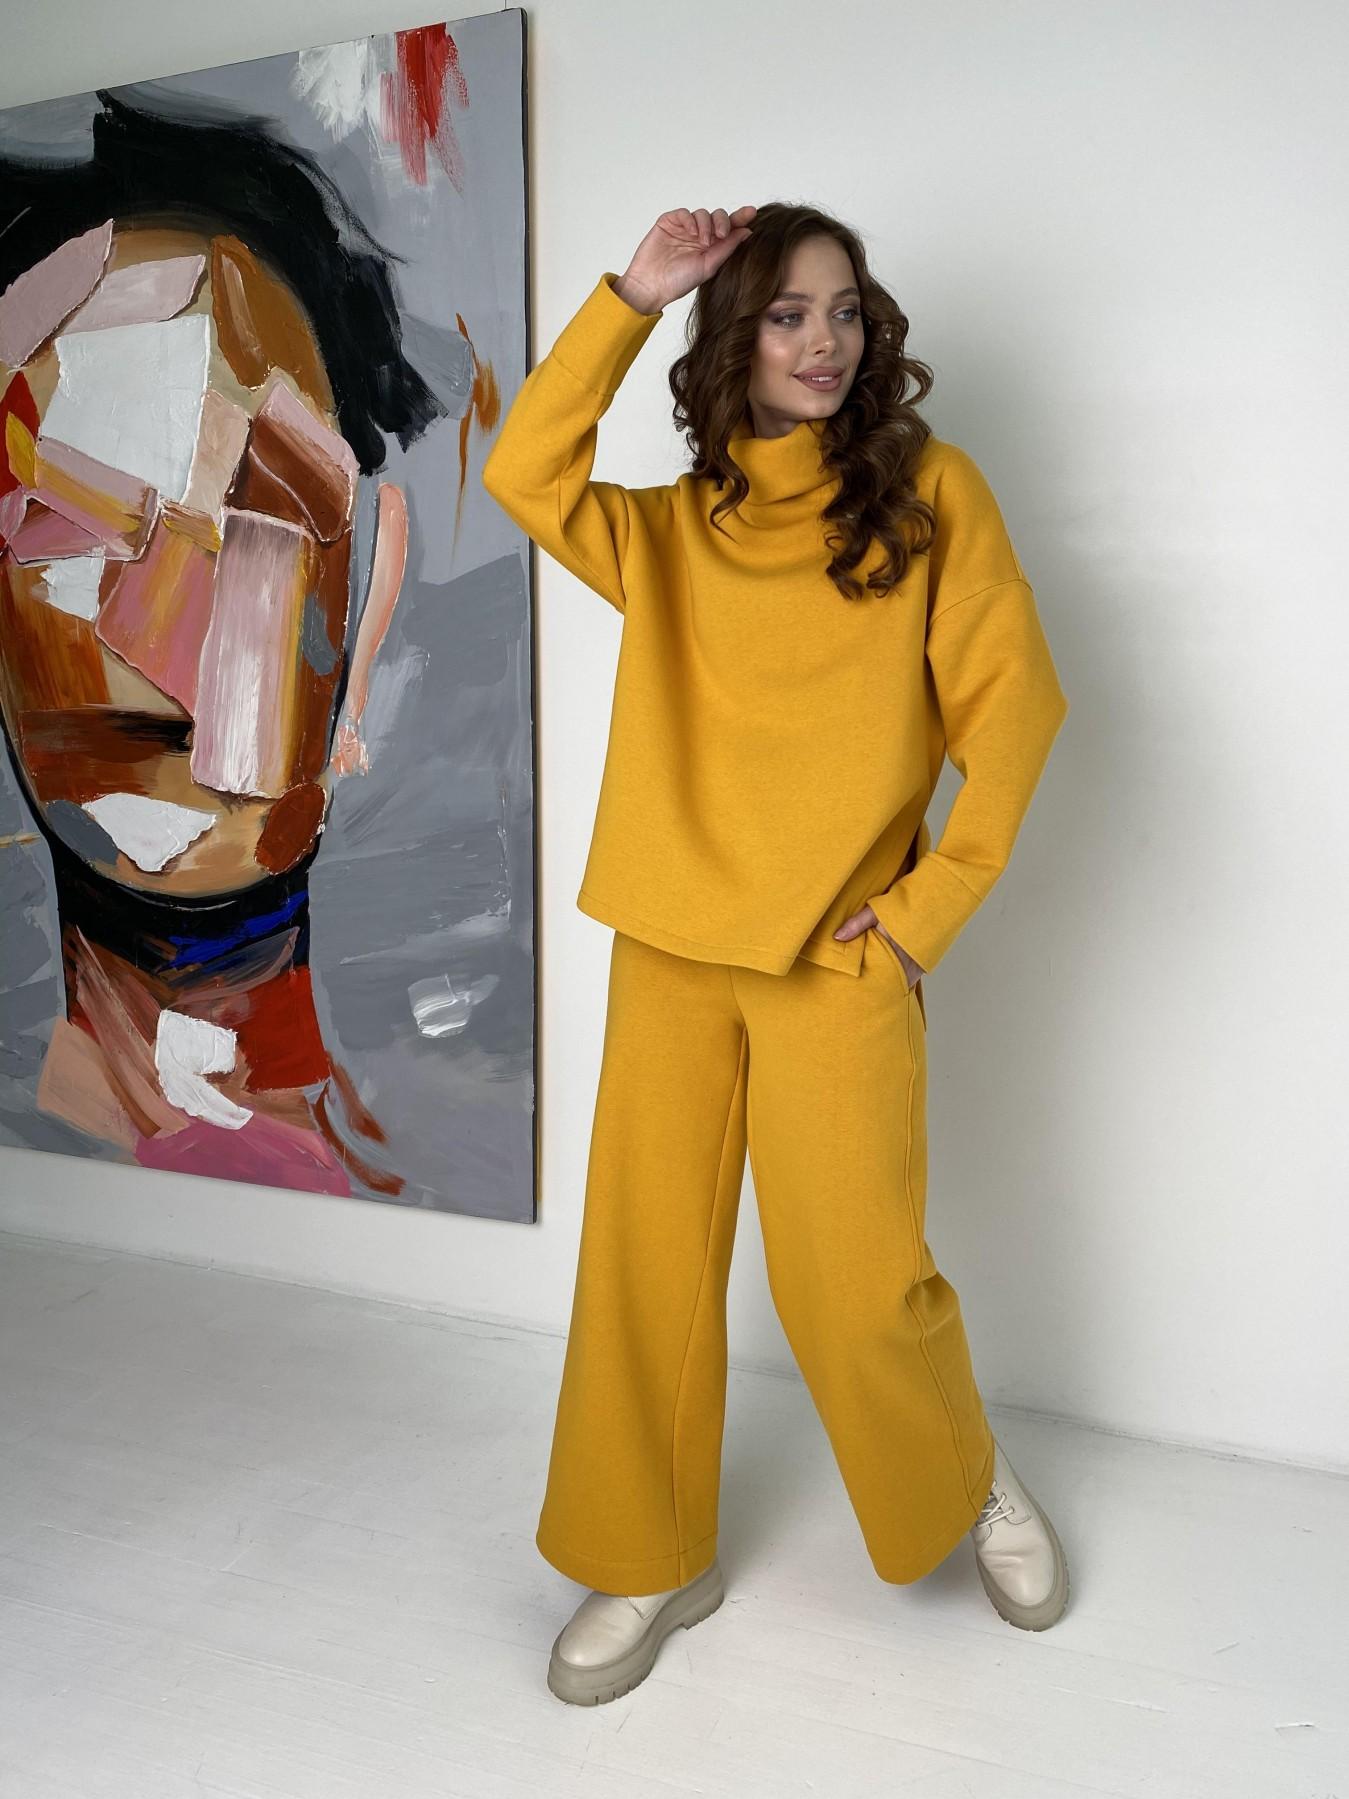 Джаст костюм на флисе 3х нитка 10513 АРТ. 47077 Цвет: Горчица - фото 8, интернет магазин tm-modus.ru